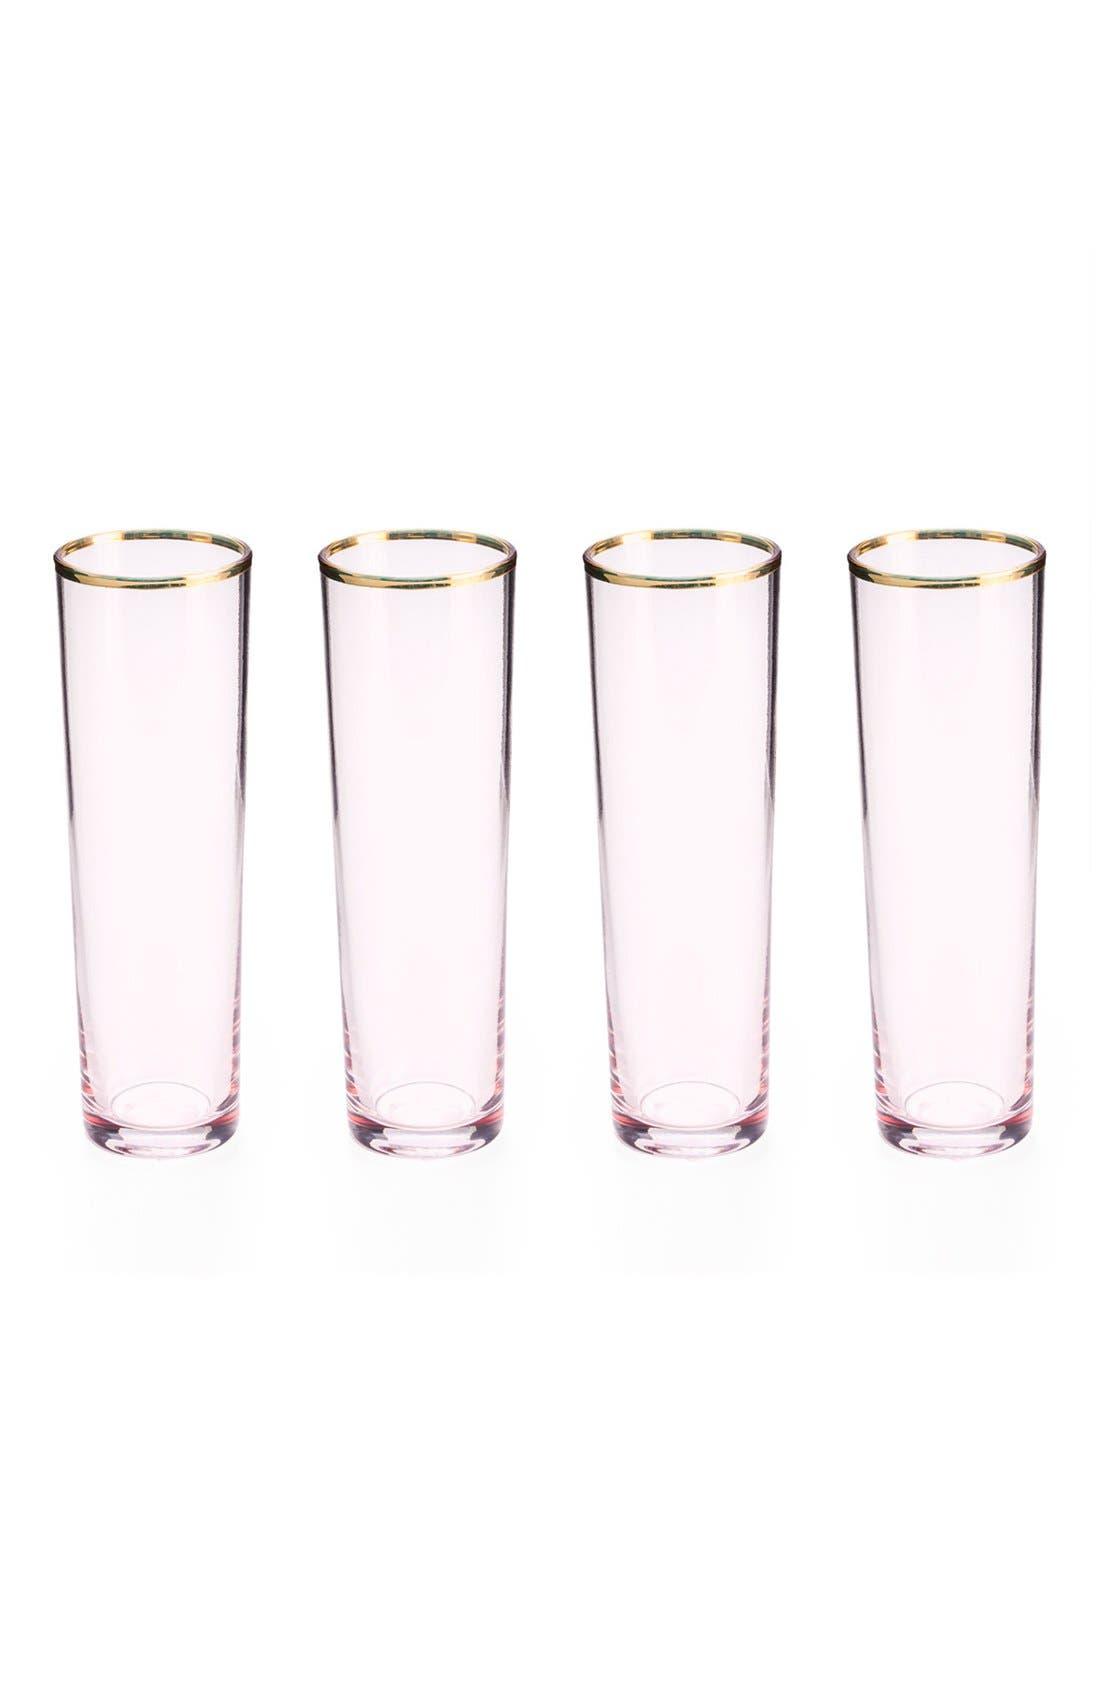 Alternate Image 1 Selected - Rosanna Pink Glass Champagne Flutes (Set of 4)